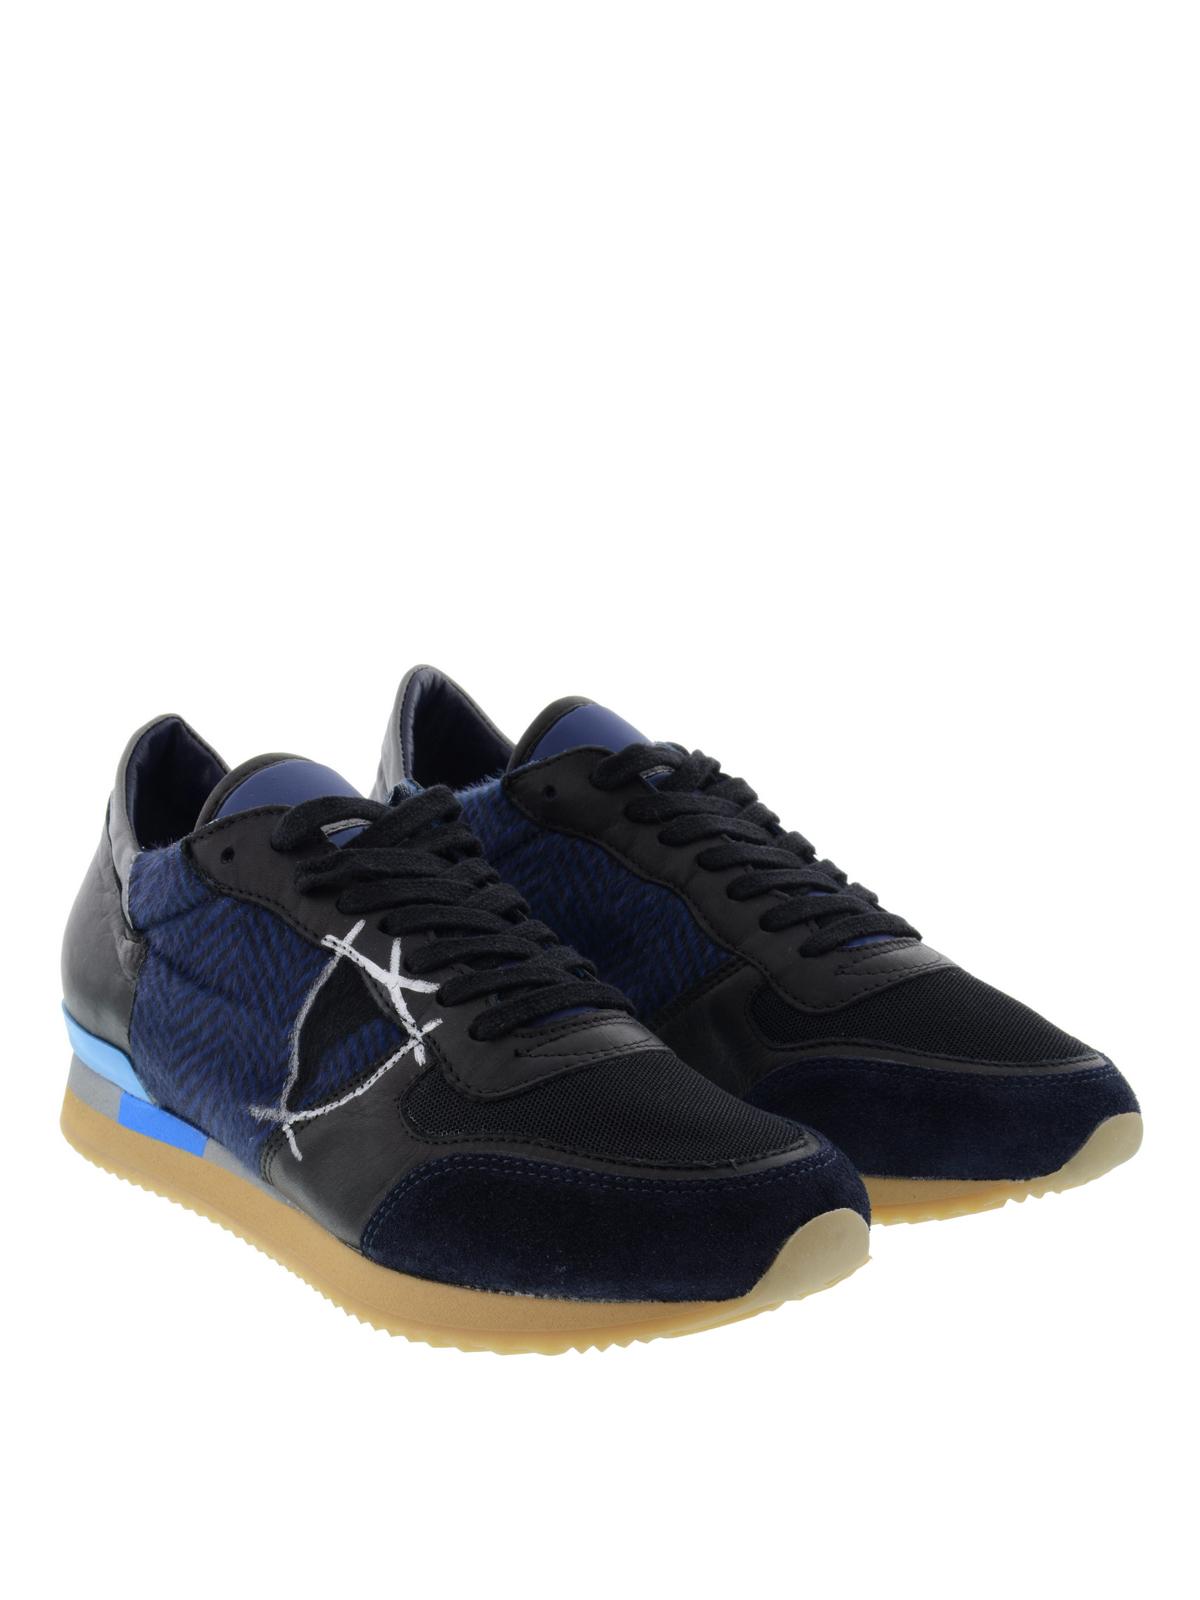 sneaker tropez mix philippe model sneakers ikrix. Black Bedroom Furniture Sets. Home Design Ideas